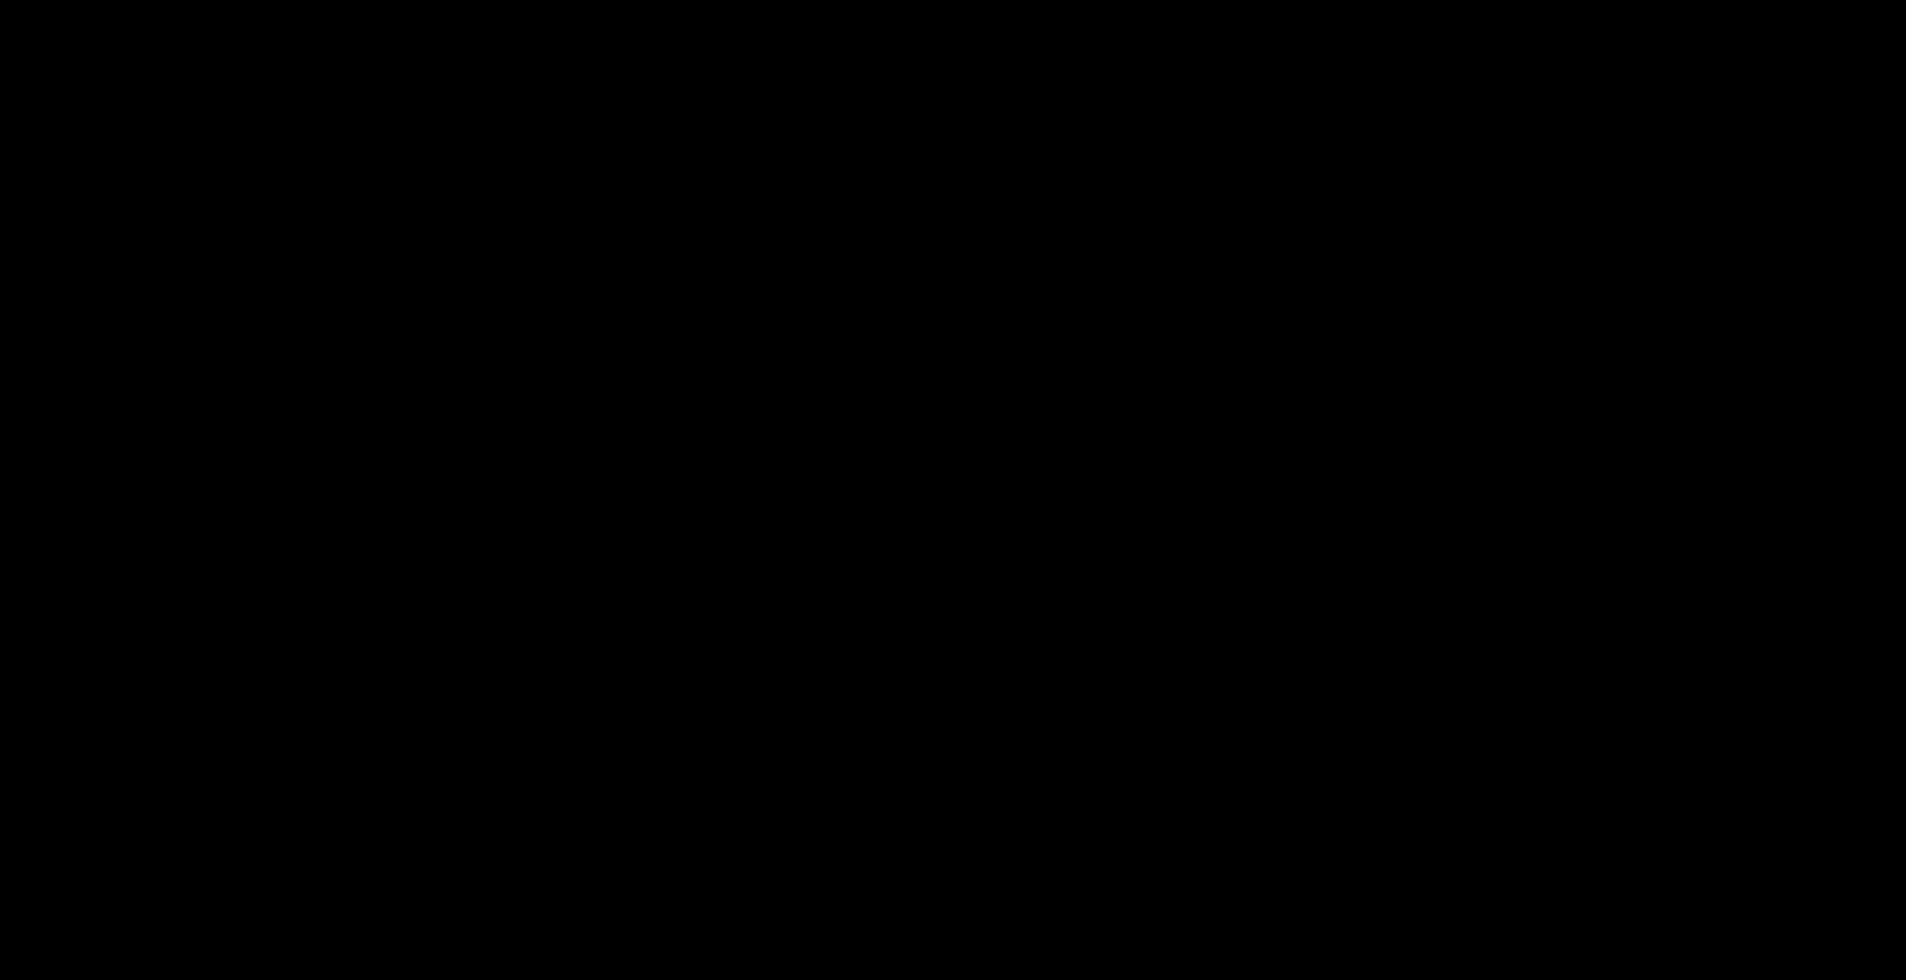 Dinosaurier Schädel png